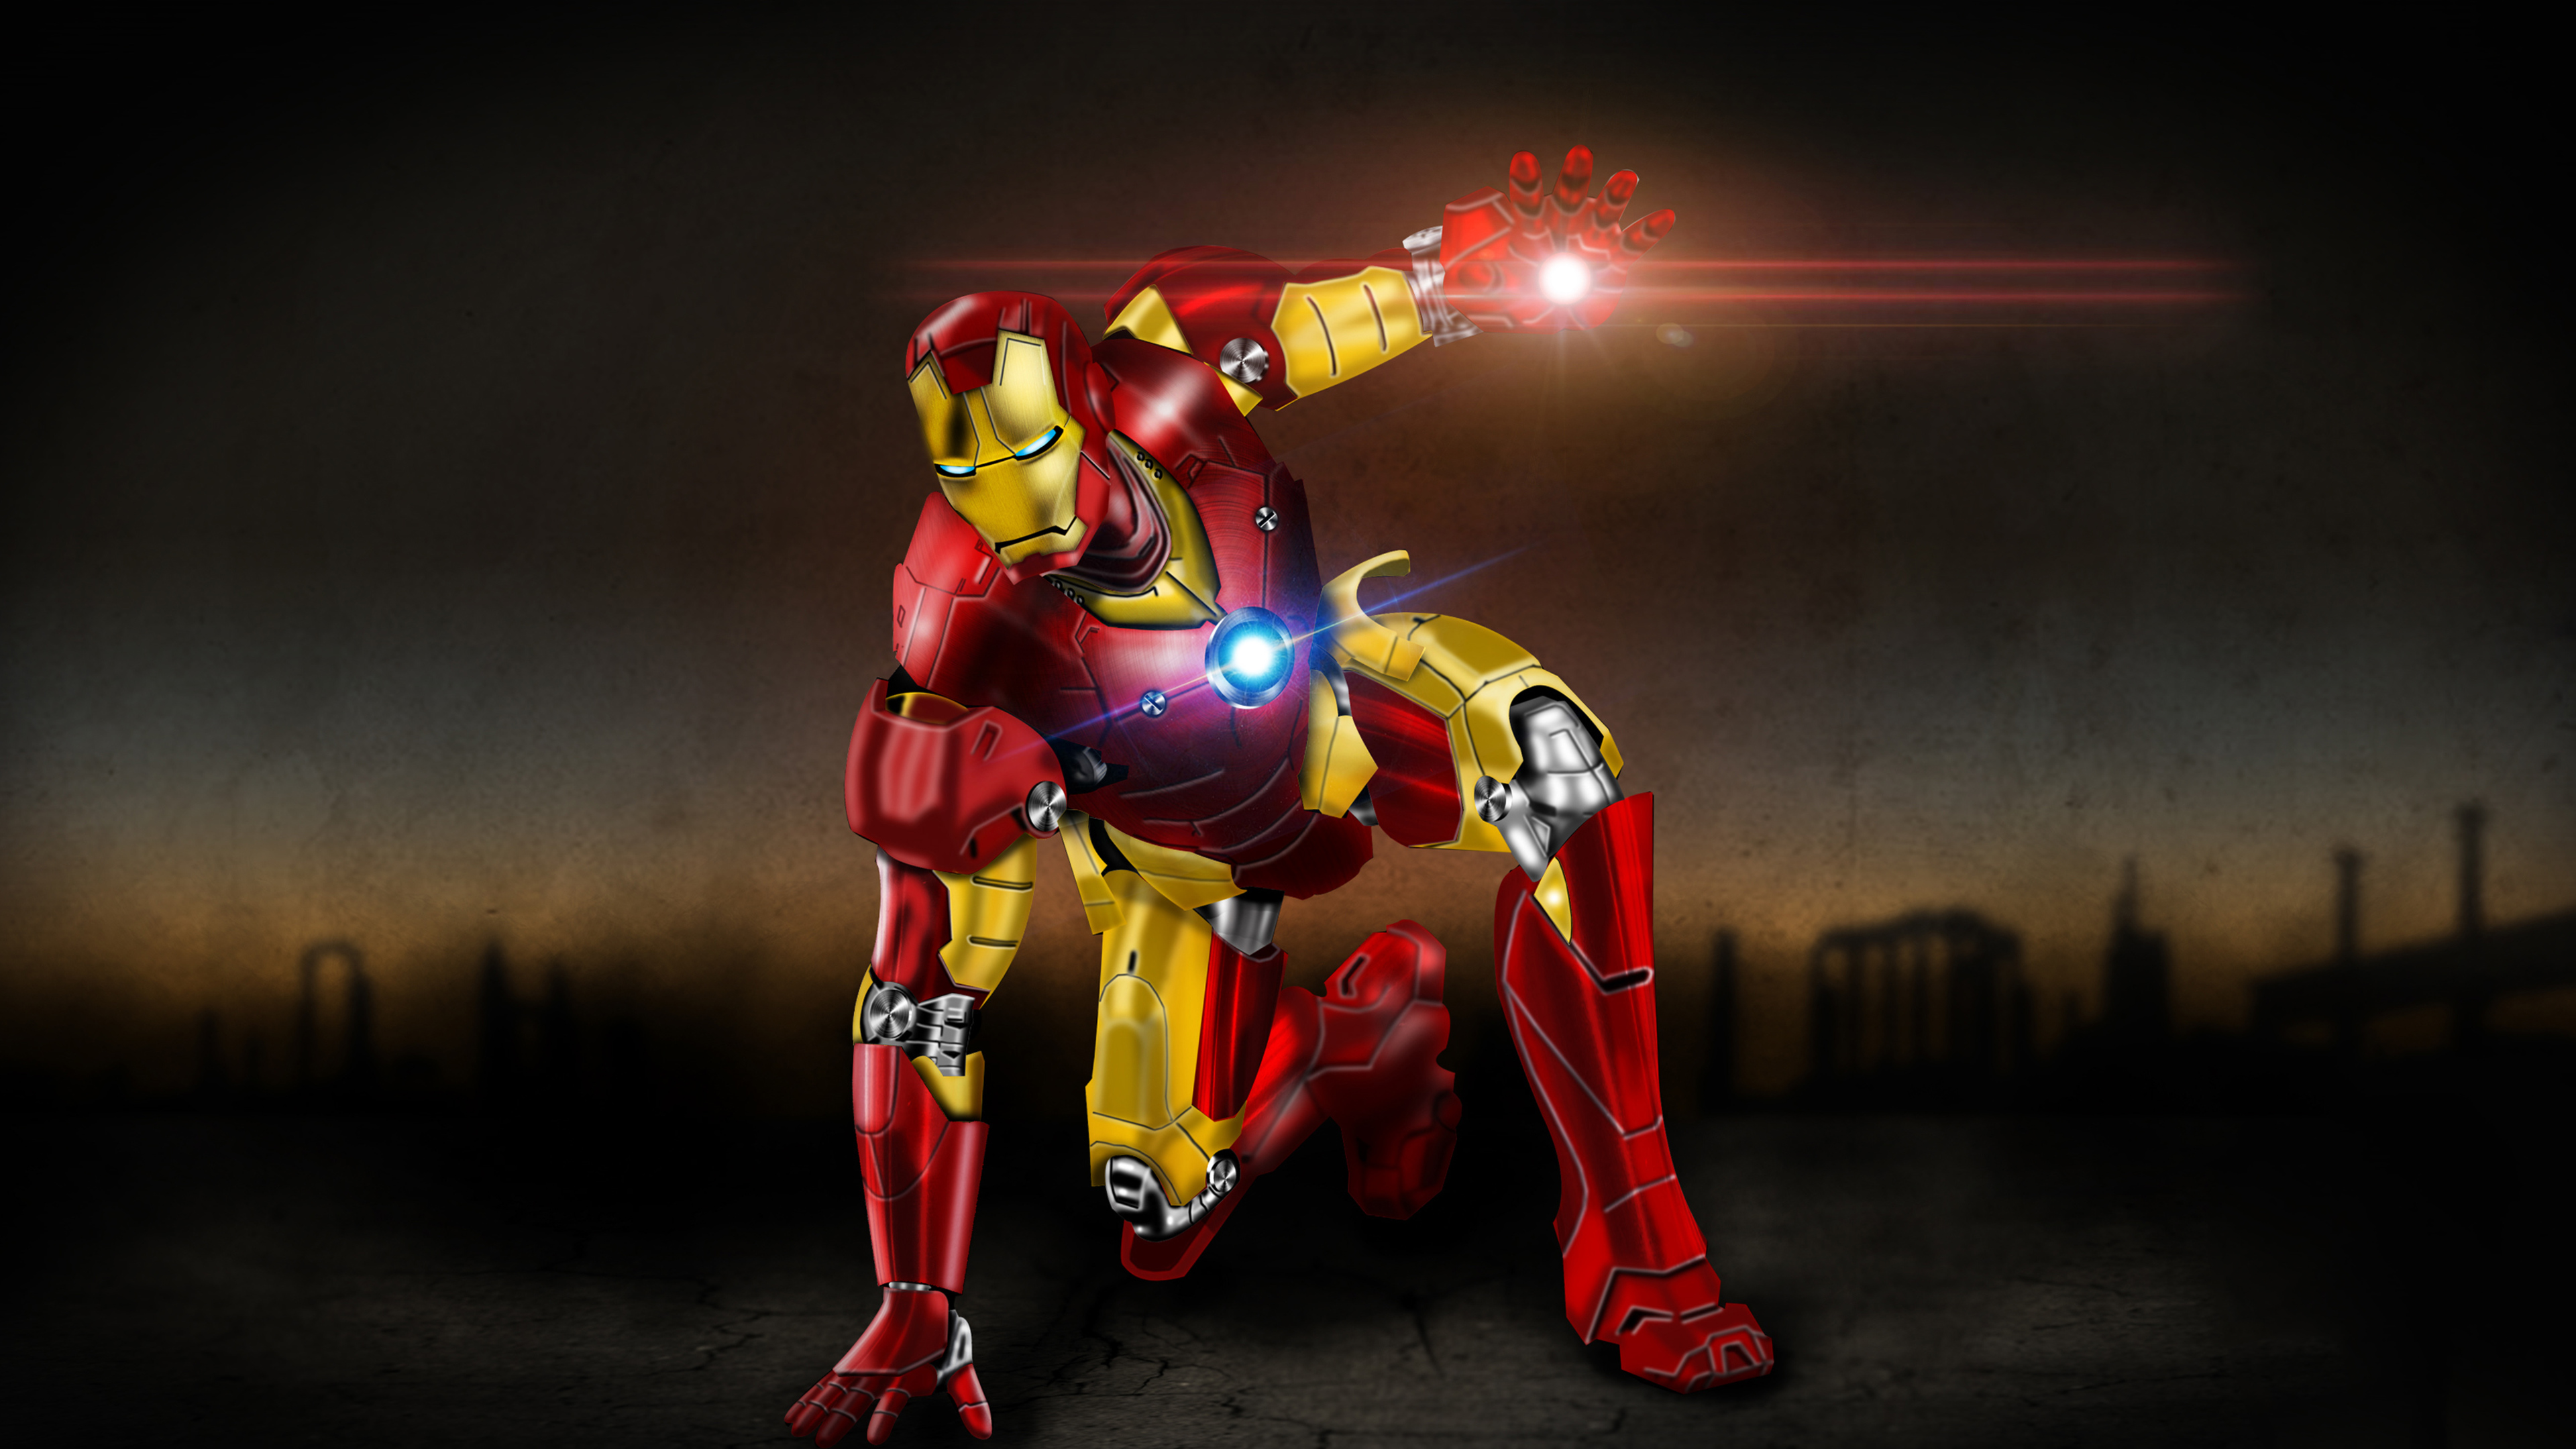 iron man avengers endgame new 4k 1557260453 - Iron Man Avengers Endgame New 4k - superheroes wallpapers, movies wallpapers, iron man wallpapers, hd-wallpapers, behance wallpapers, avengers endgame wallpapers, 4k-wallpapers, 2019 movies wallpapers